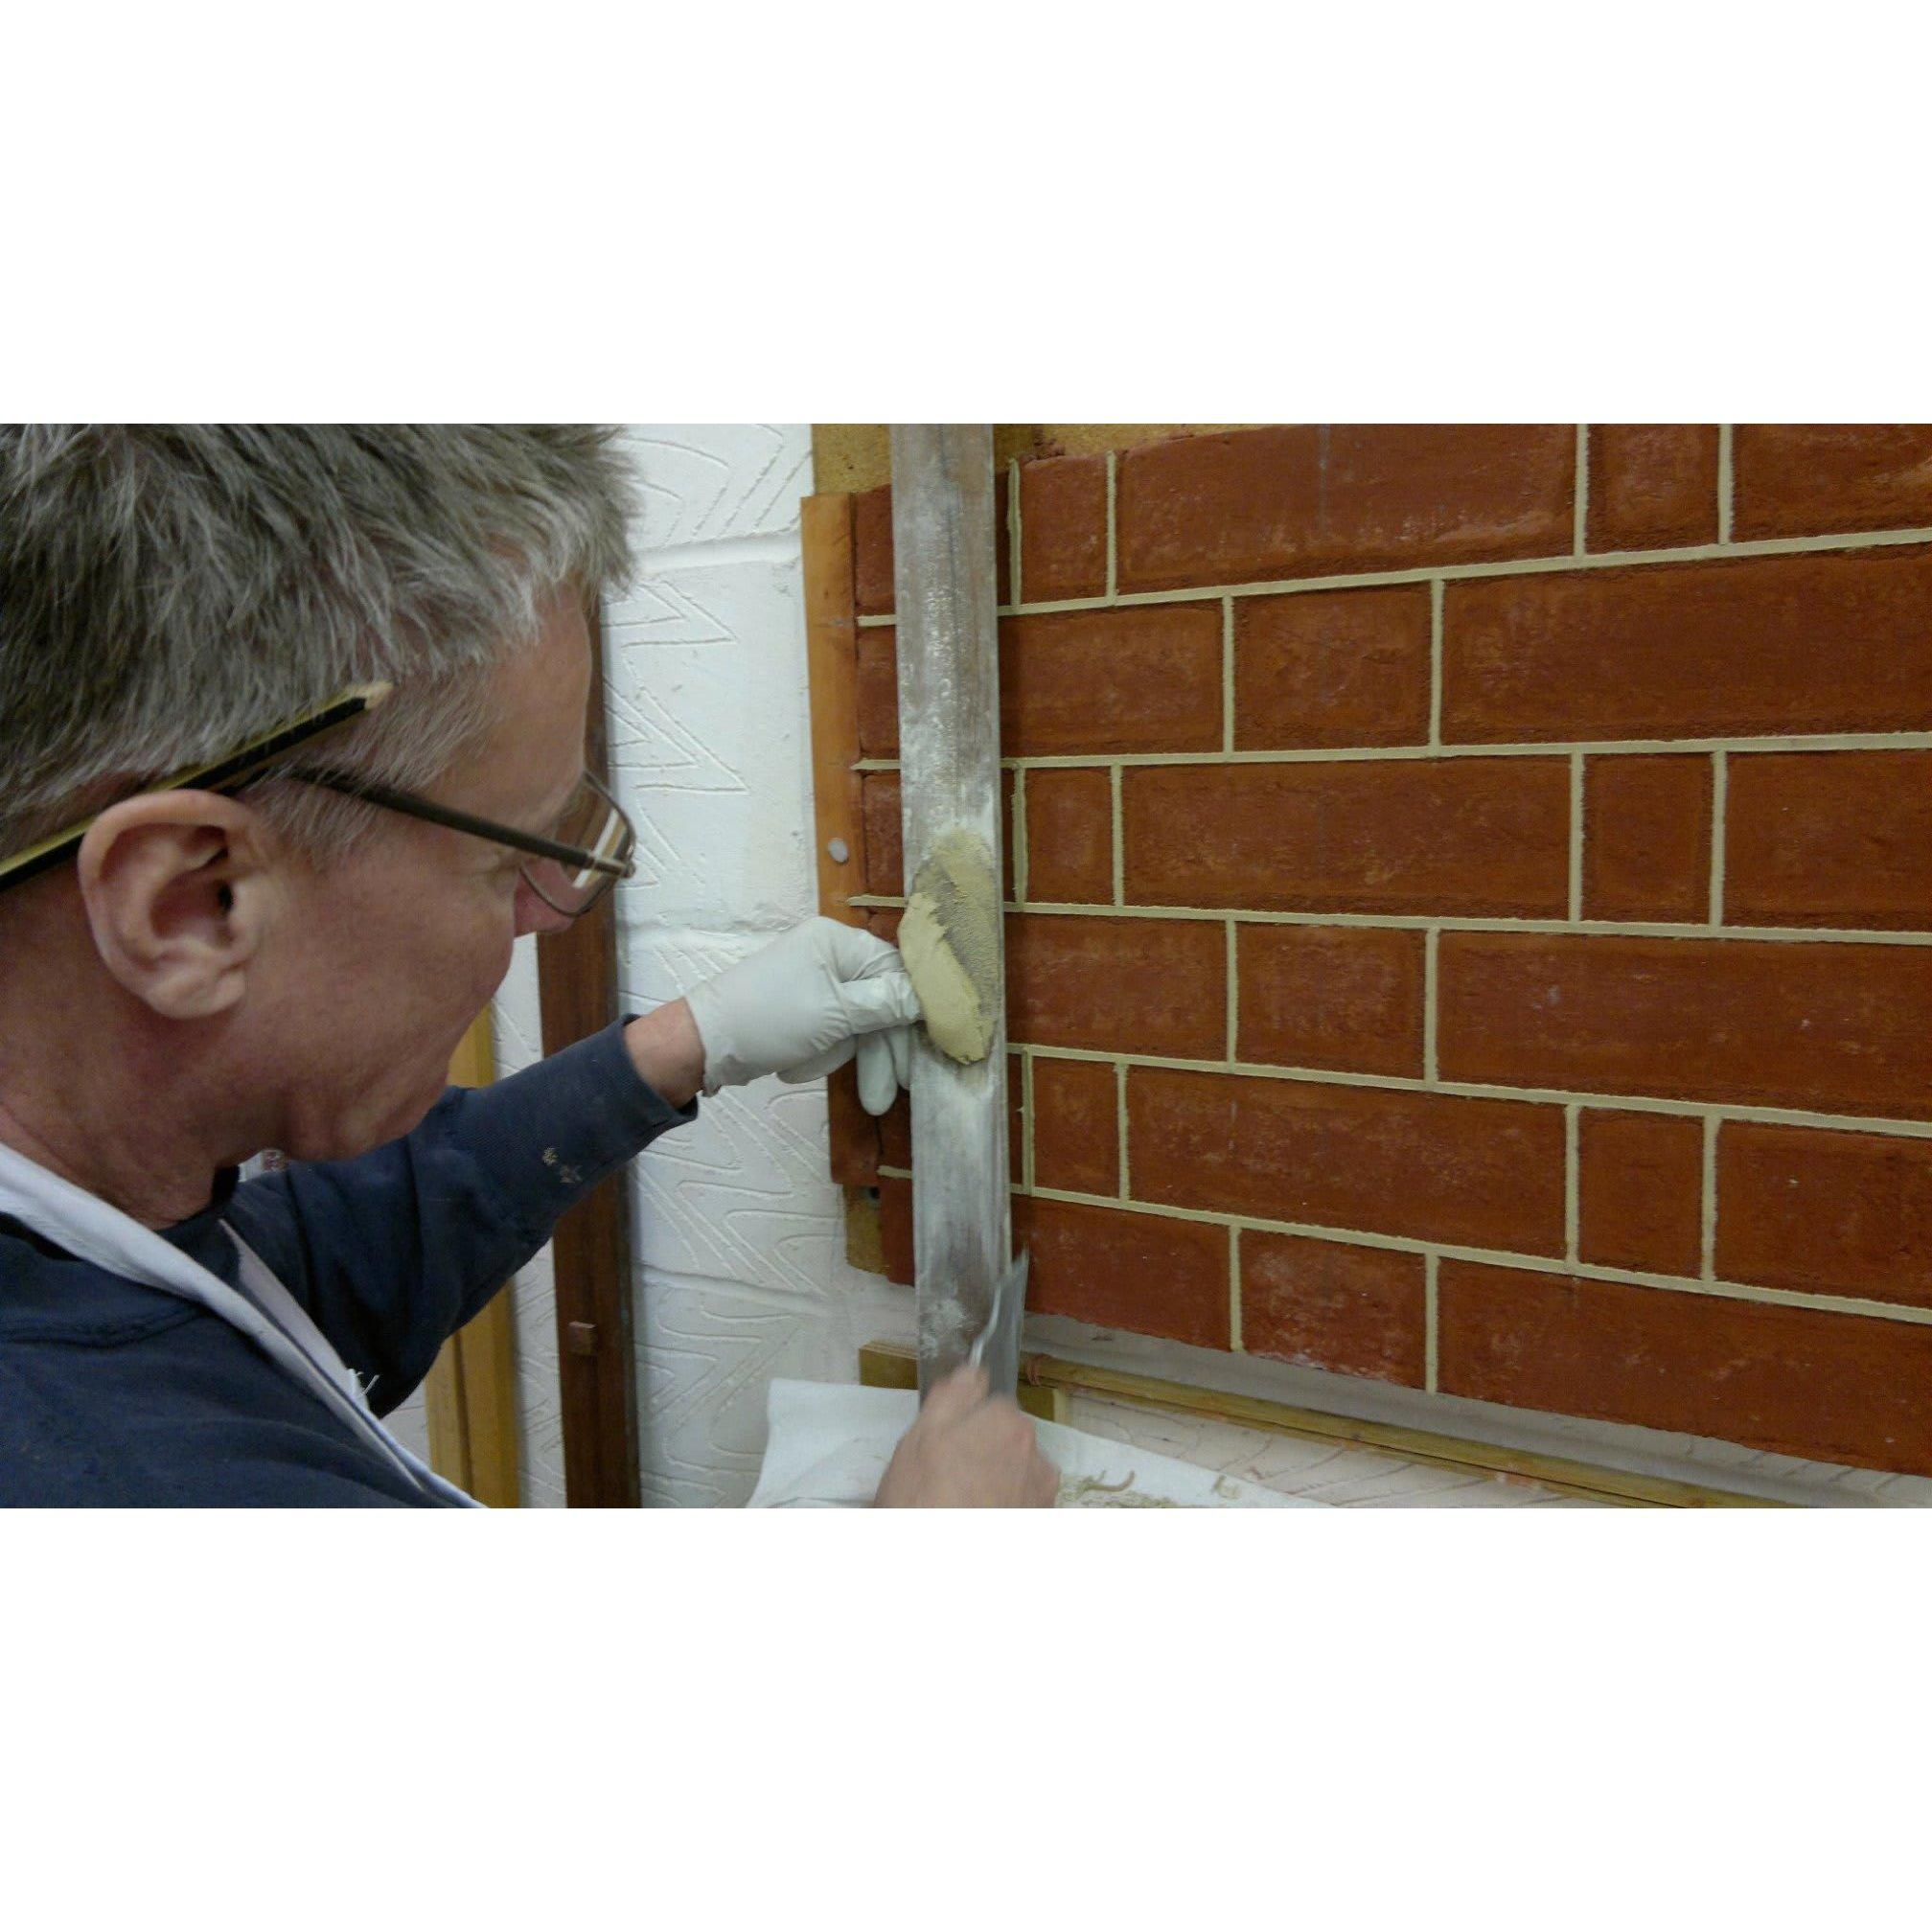 R.J Hobday Bricklayers - Worcester, Worcestershire WR5 1EN - 07725 484528 | ShowMeLocal.com